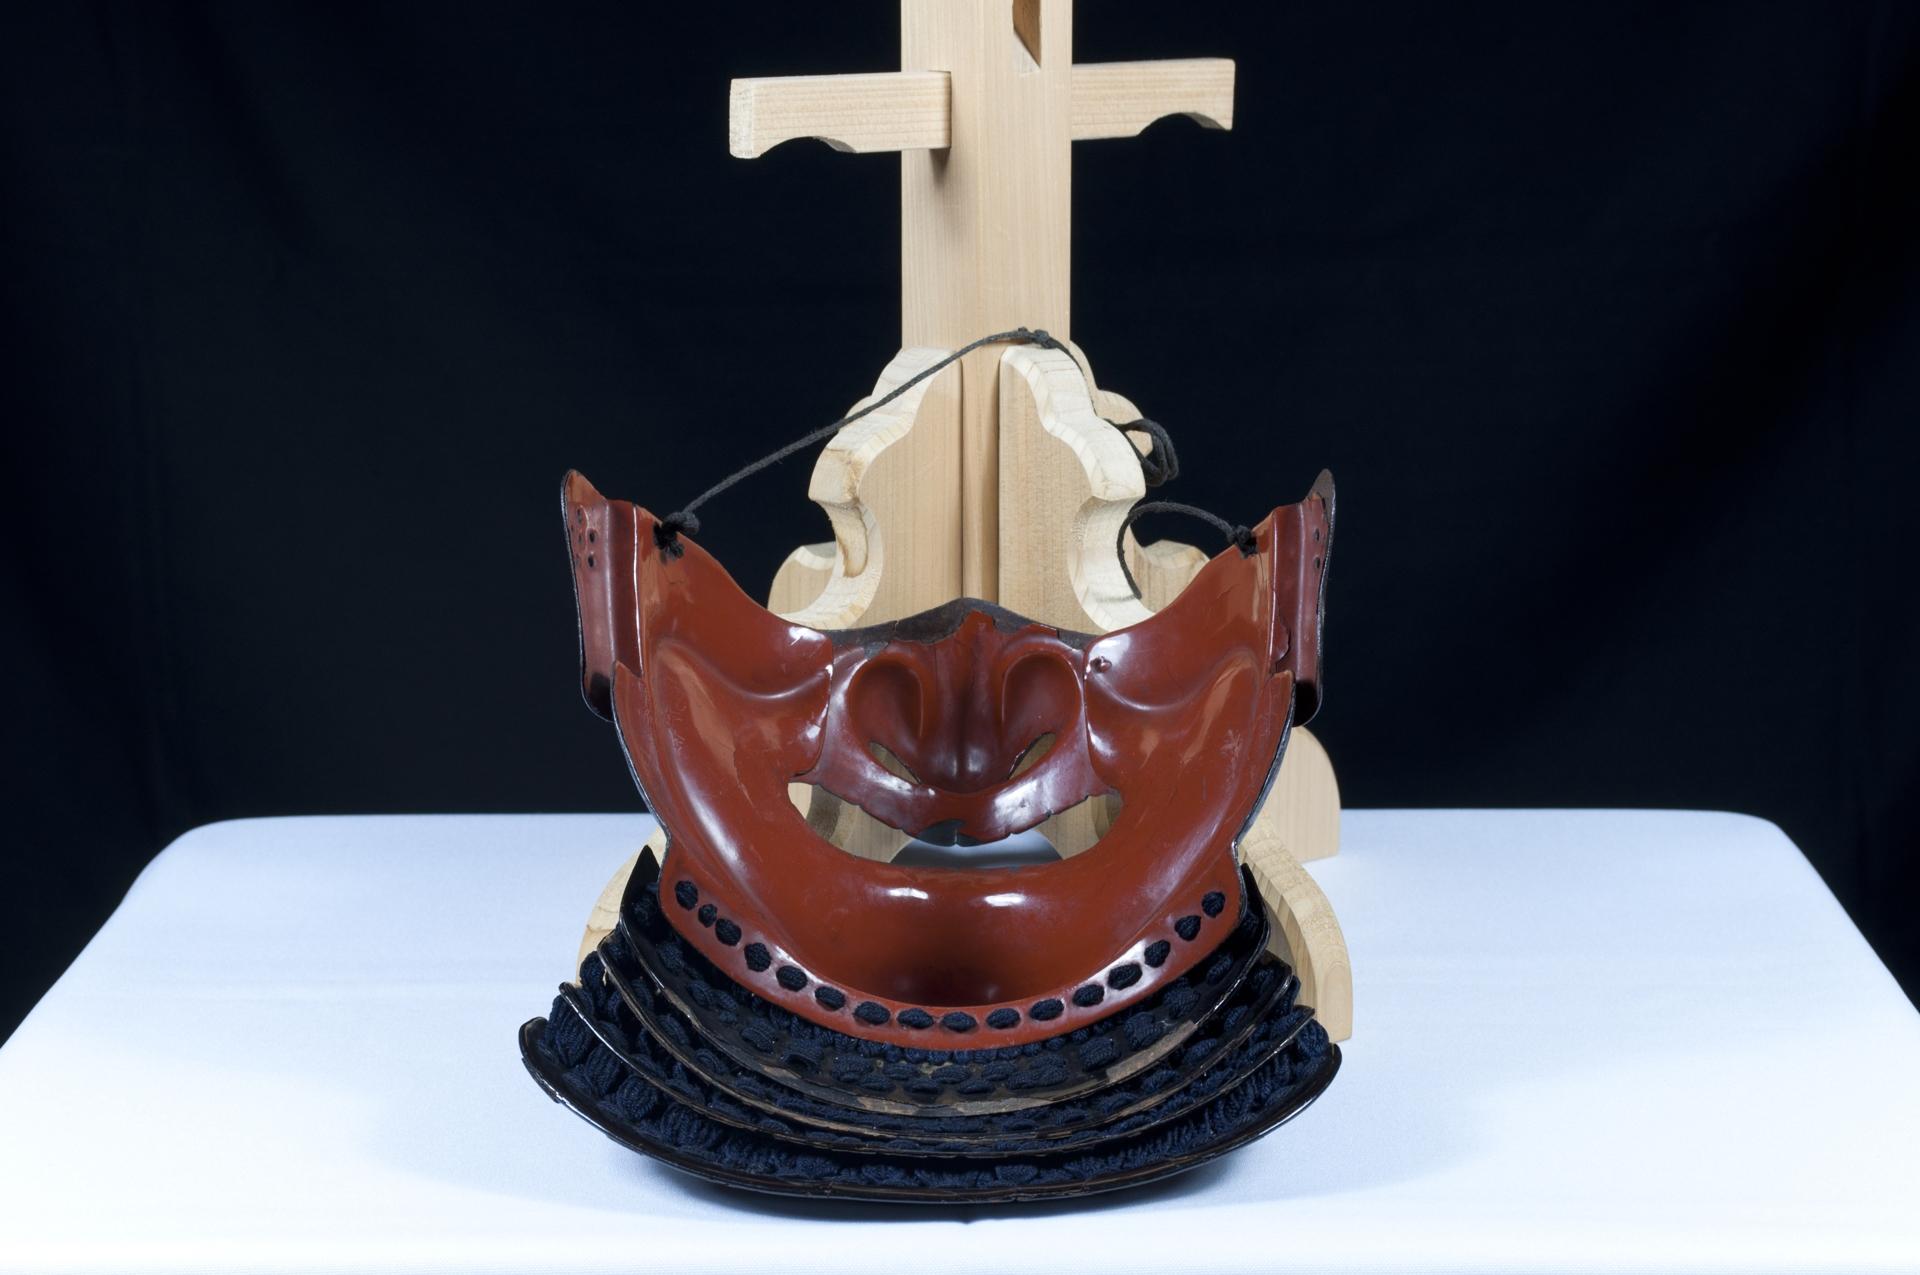 Menpo Reissei fer naturel Edo Armure Yoroi (5)